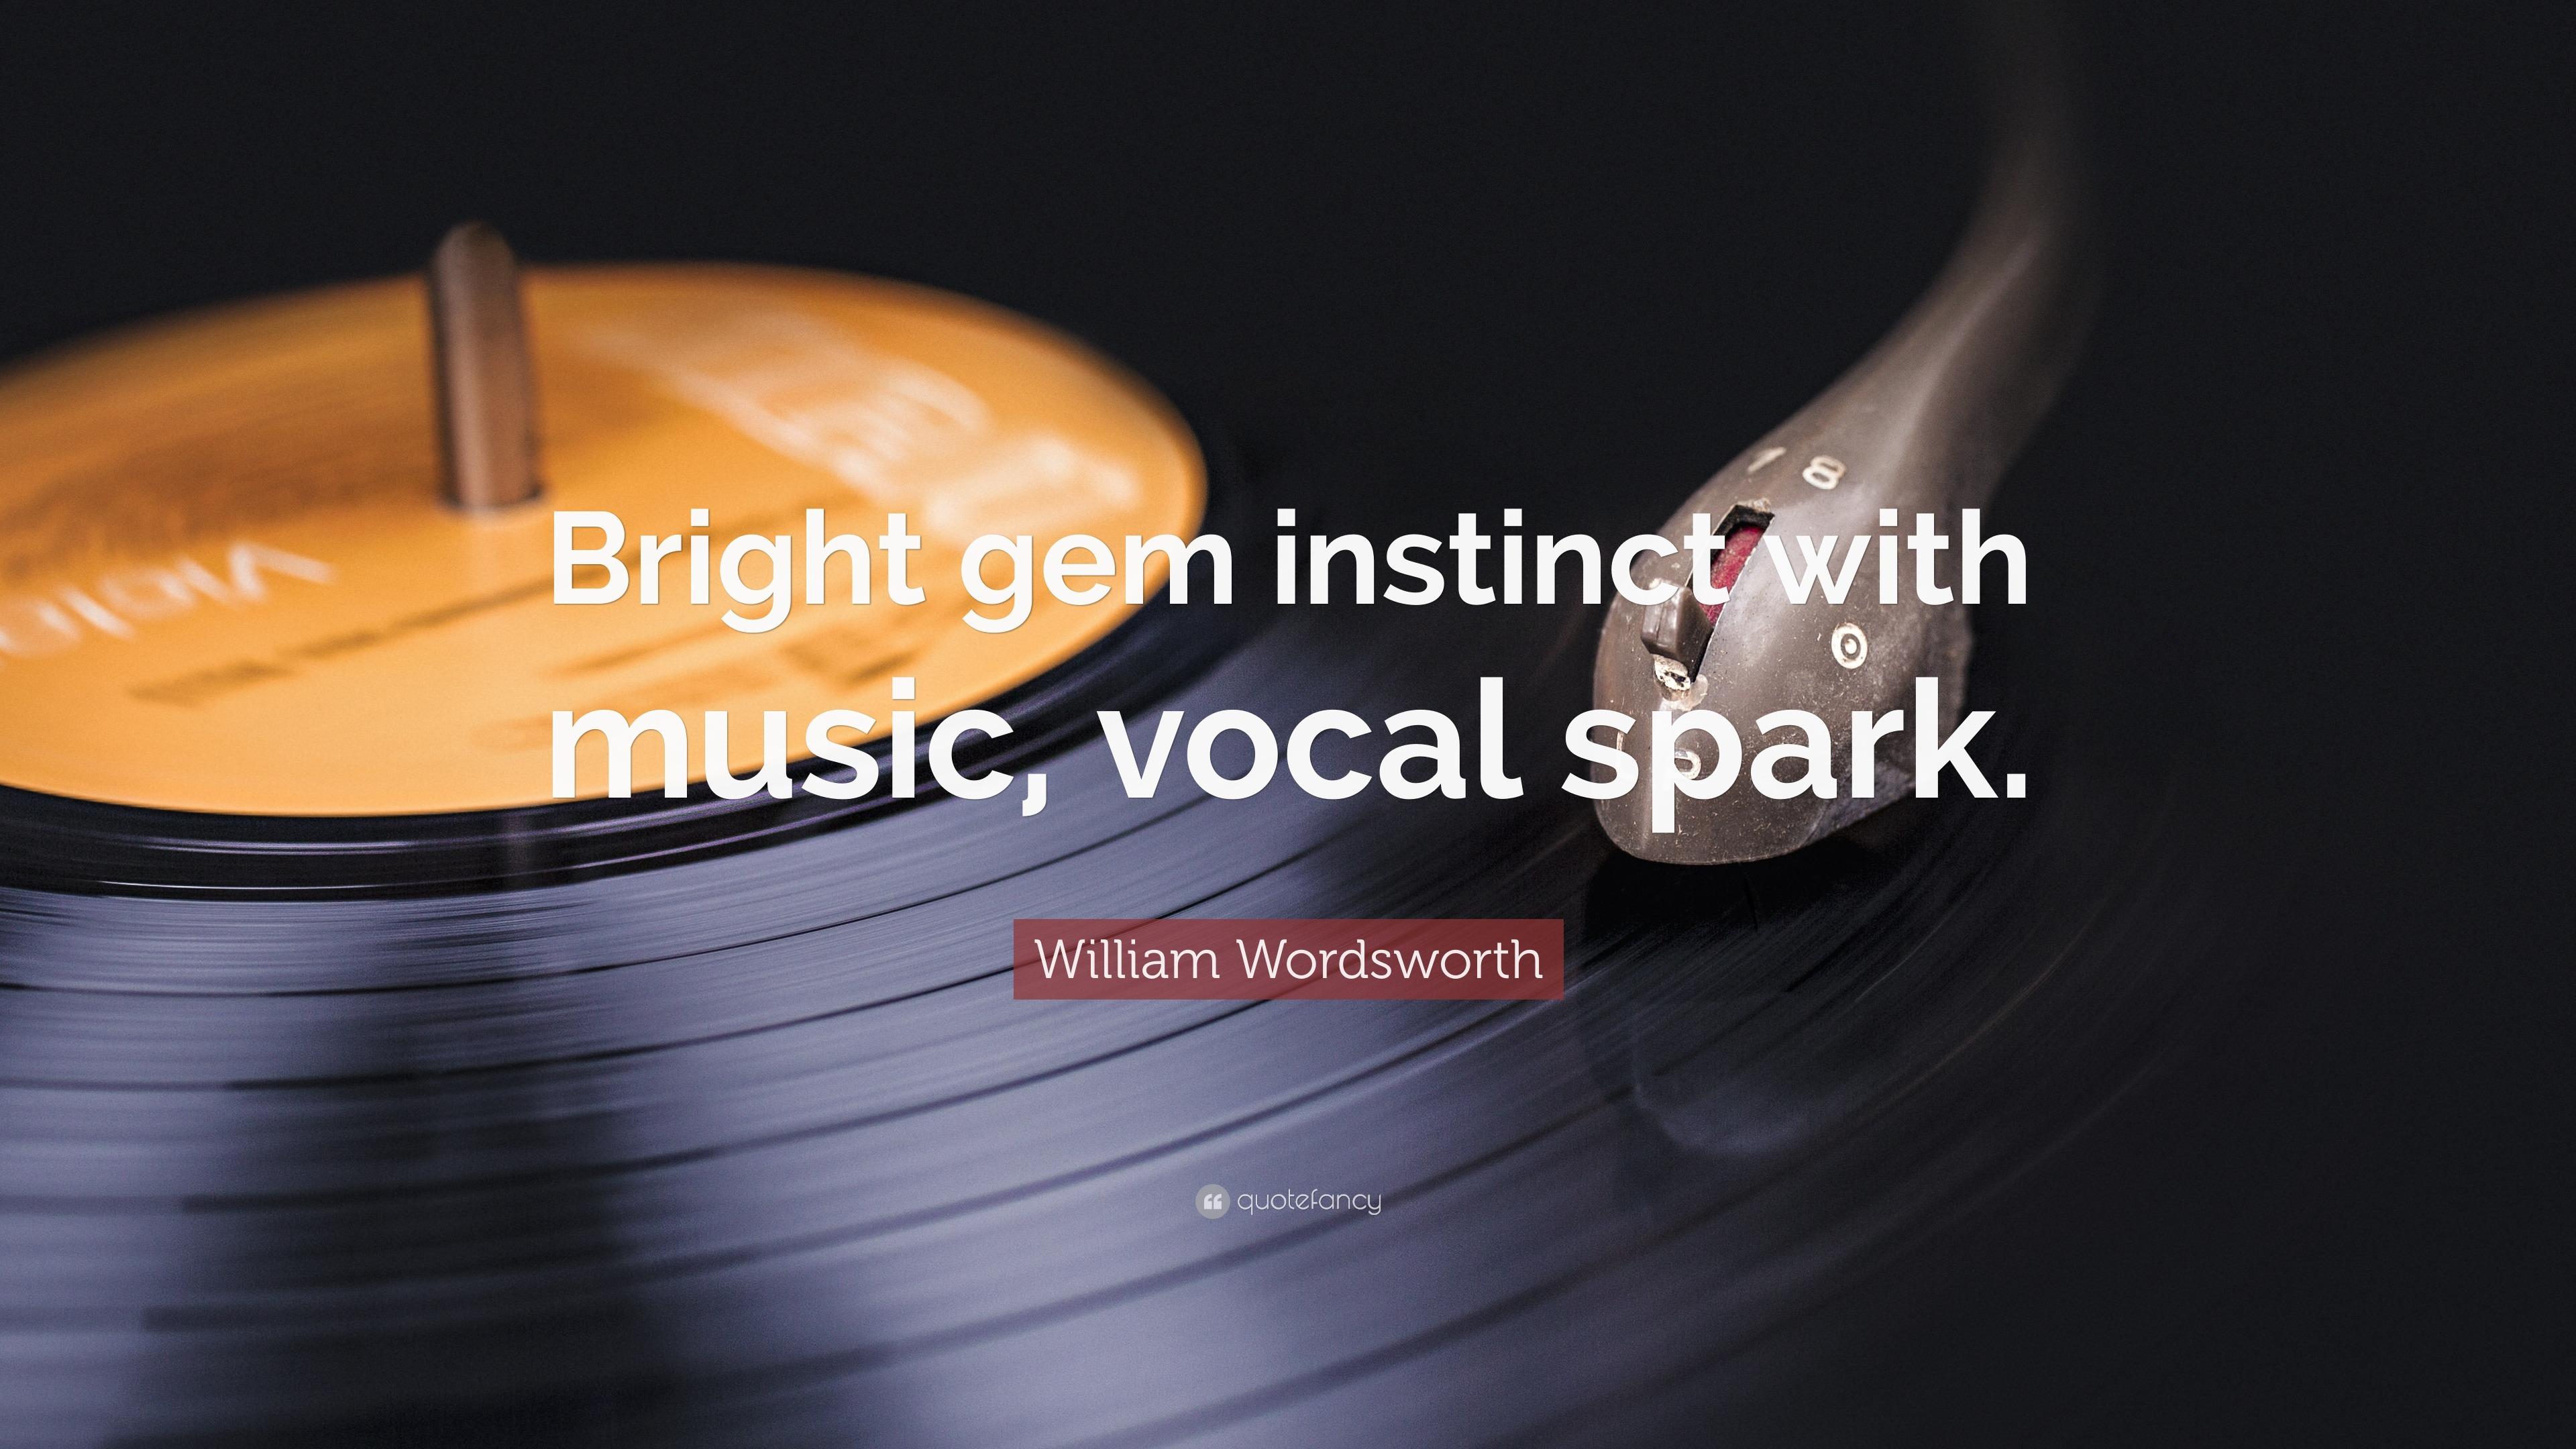 Wonderful Wallpaper Music Bright - 244438-William-Wordsworth-Quote-Bright-gem-instinct-with-music-vocal  HD_59670.jpg